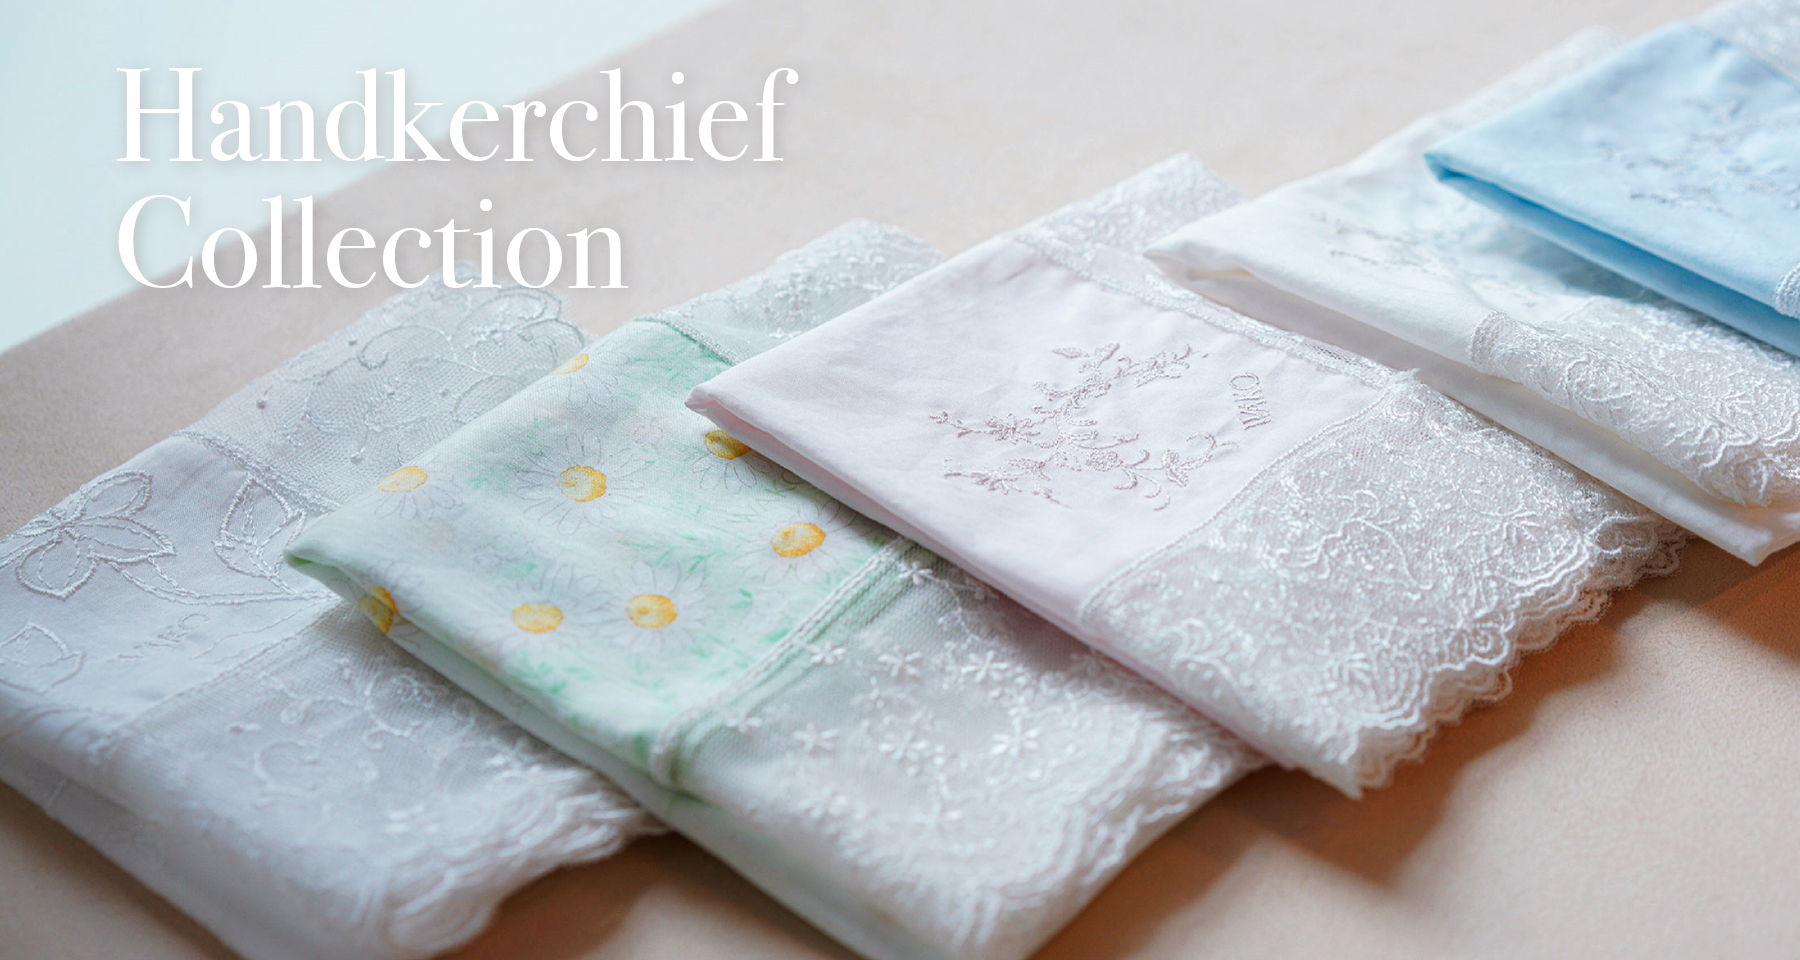 Handkerchief Collection